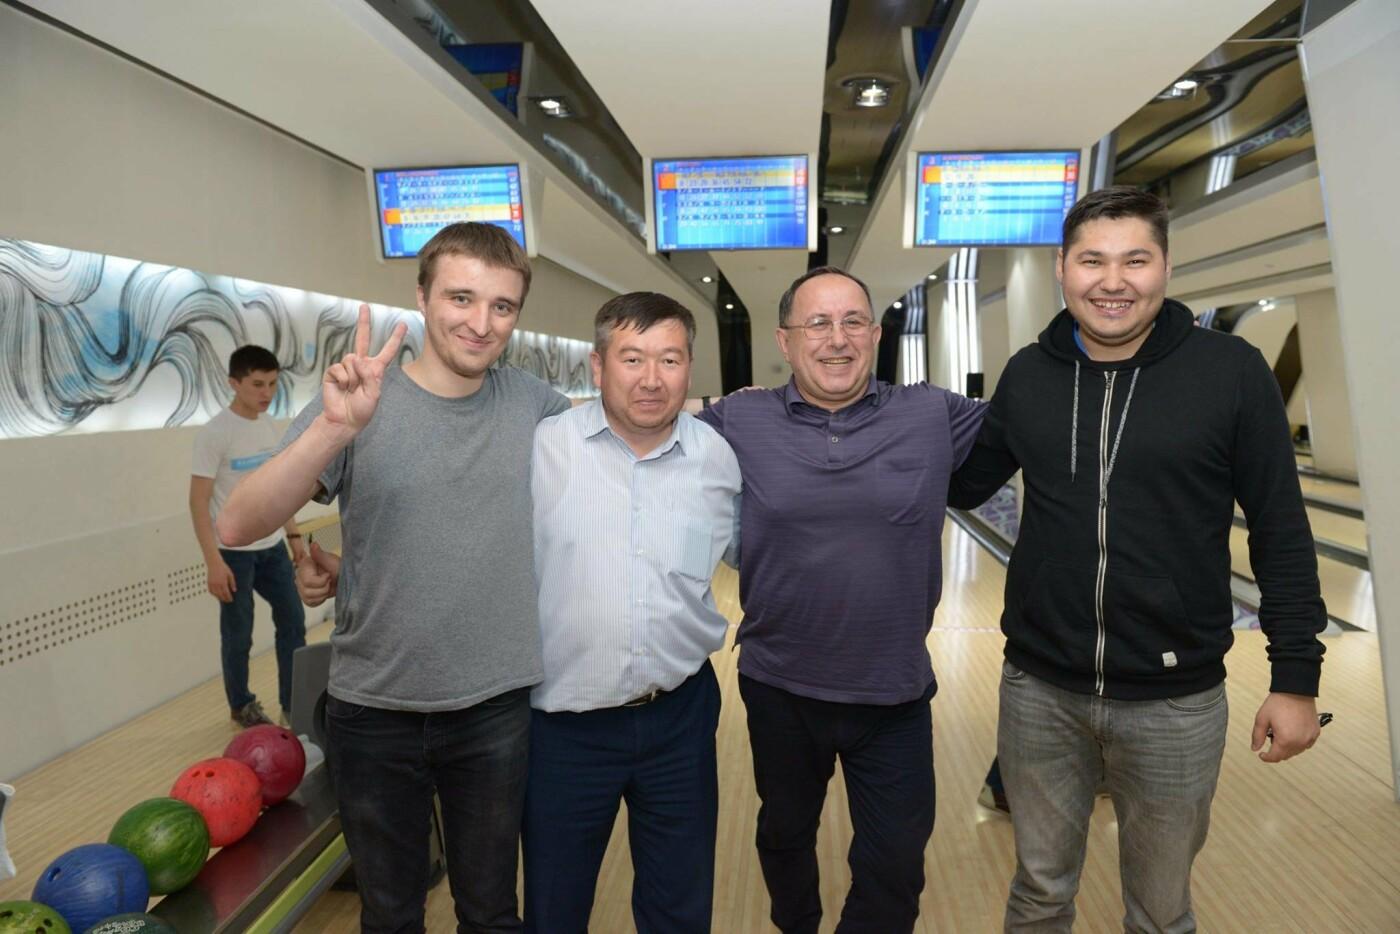 II турнир по боулингу среди журналистов прошел в Алматы (ФОТО), фото-15